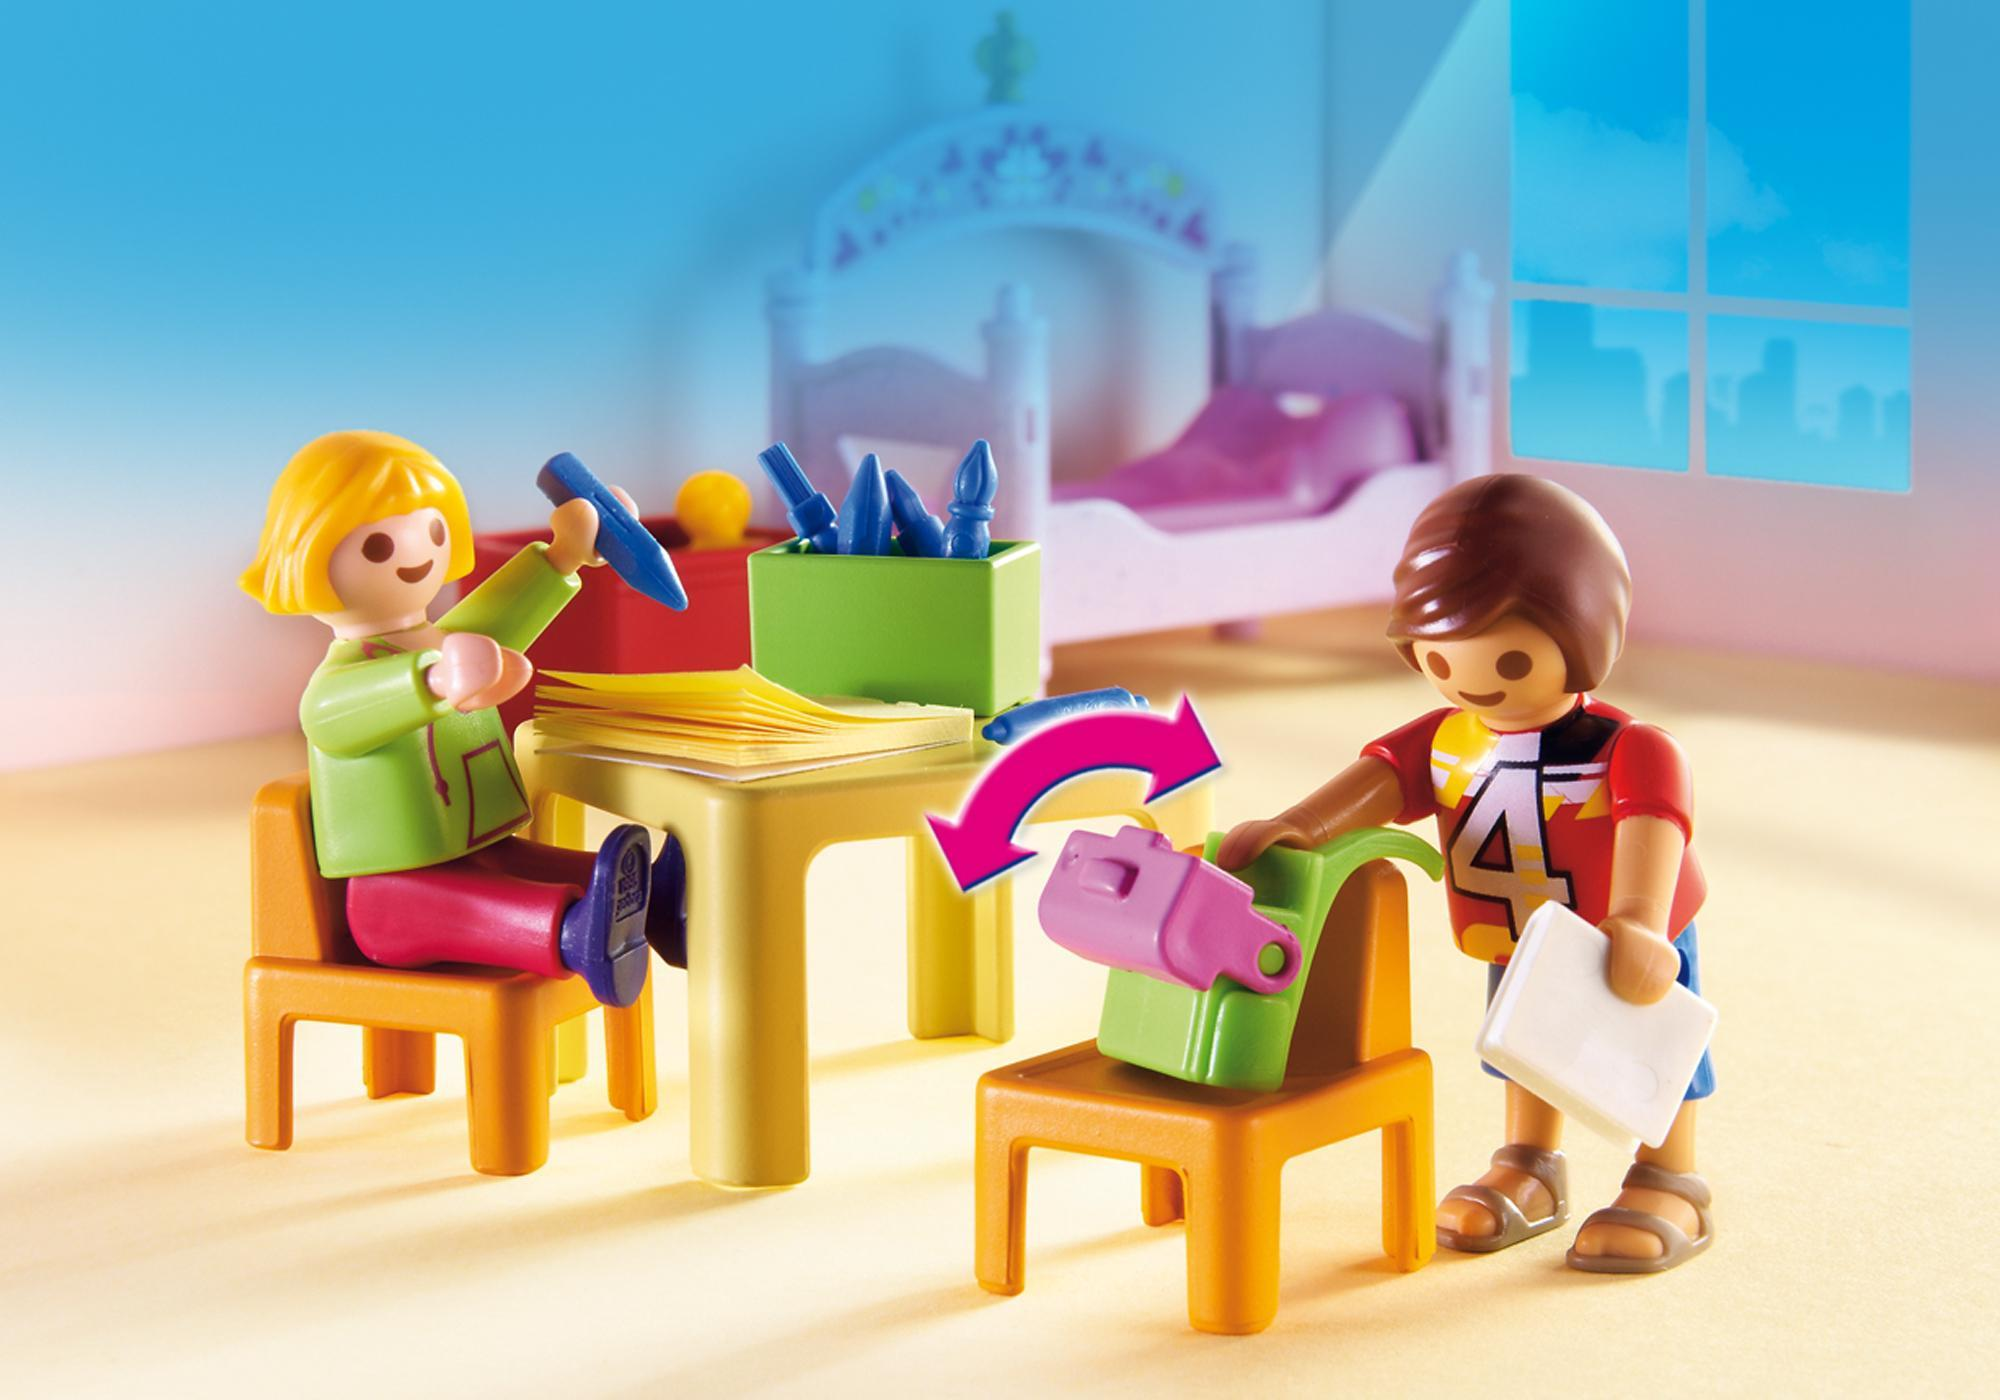 http://media.playmobil.com/i/playmobil/5306_product_extra2/Habitación de los Niños